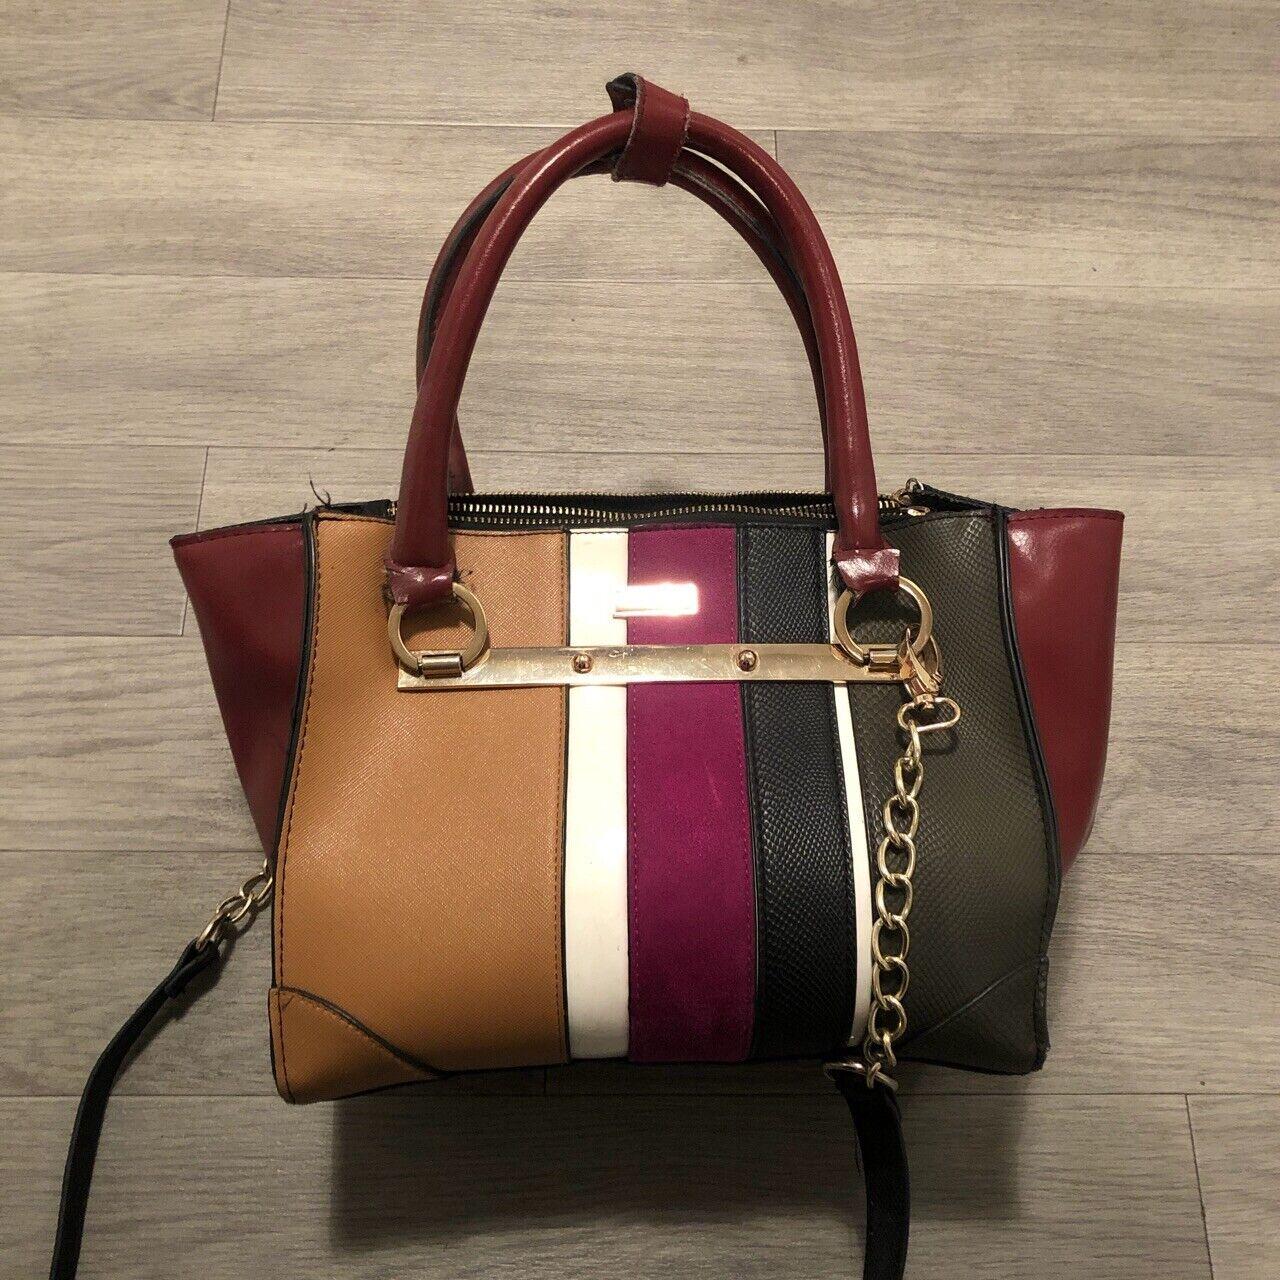 Multicoloured River Island Handbag With Shoulder Strap